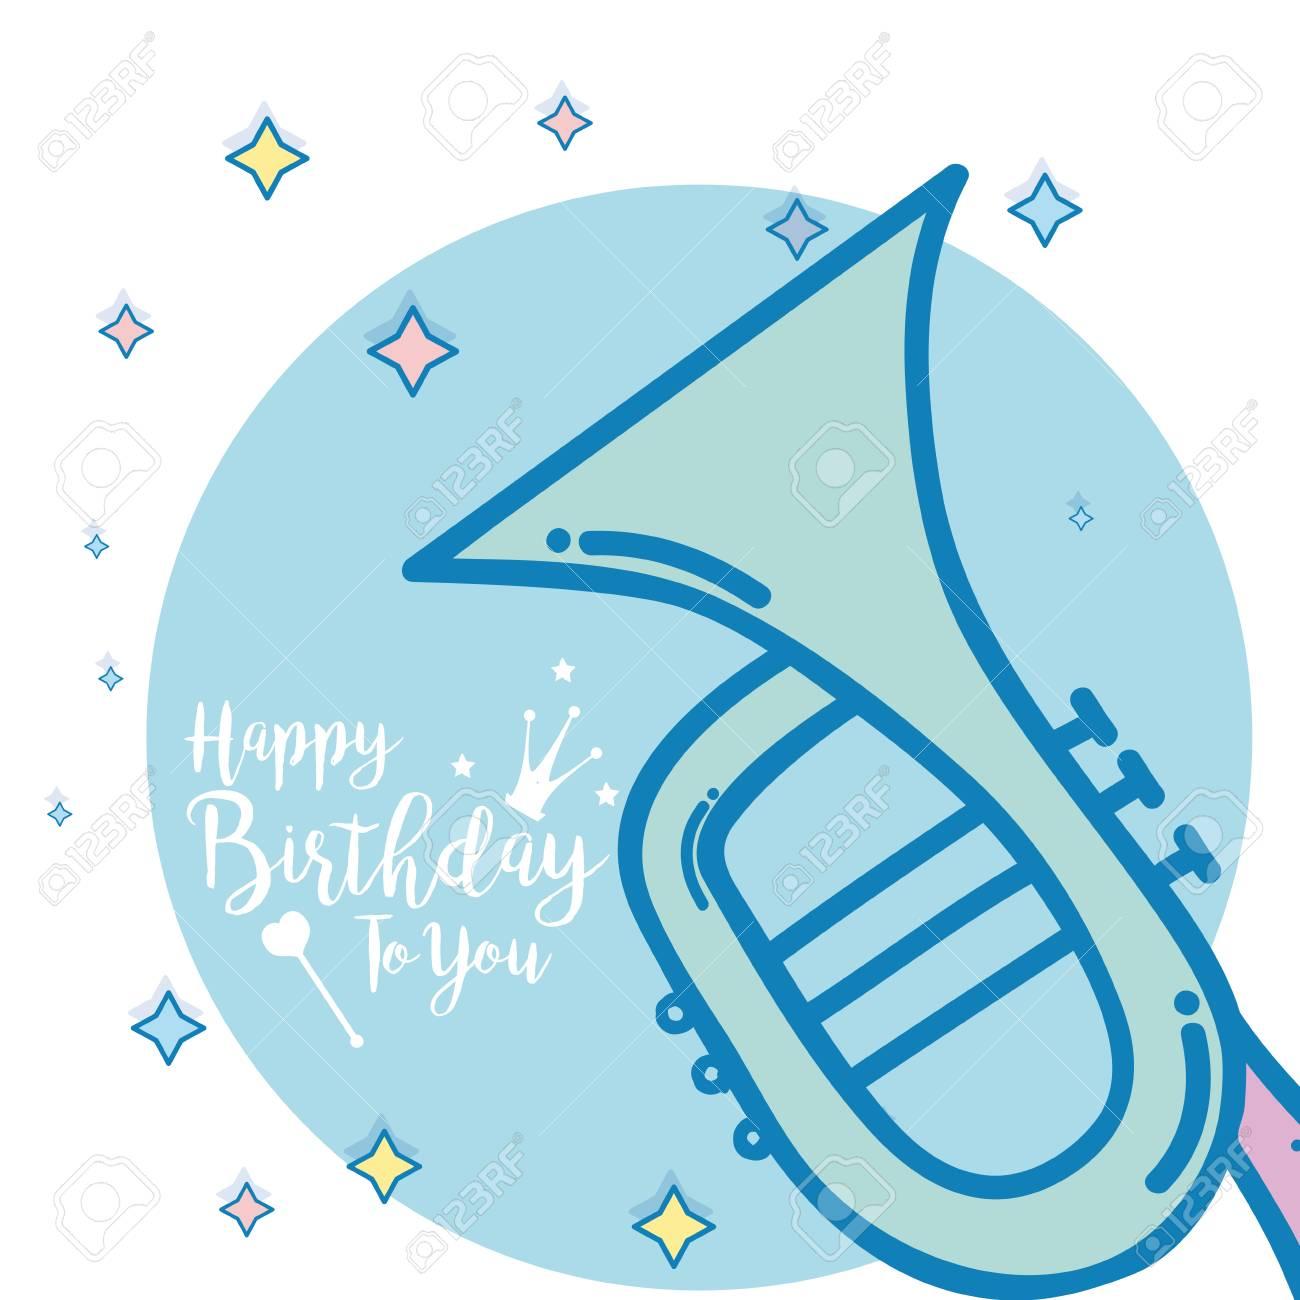 Happy Birthday Card Clip Art Libres De Droits Vecteurs Et